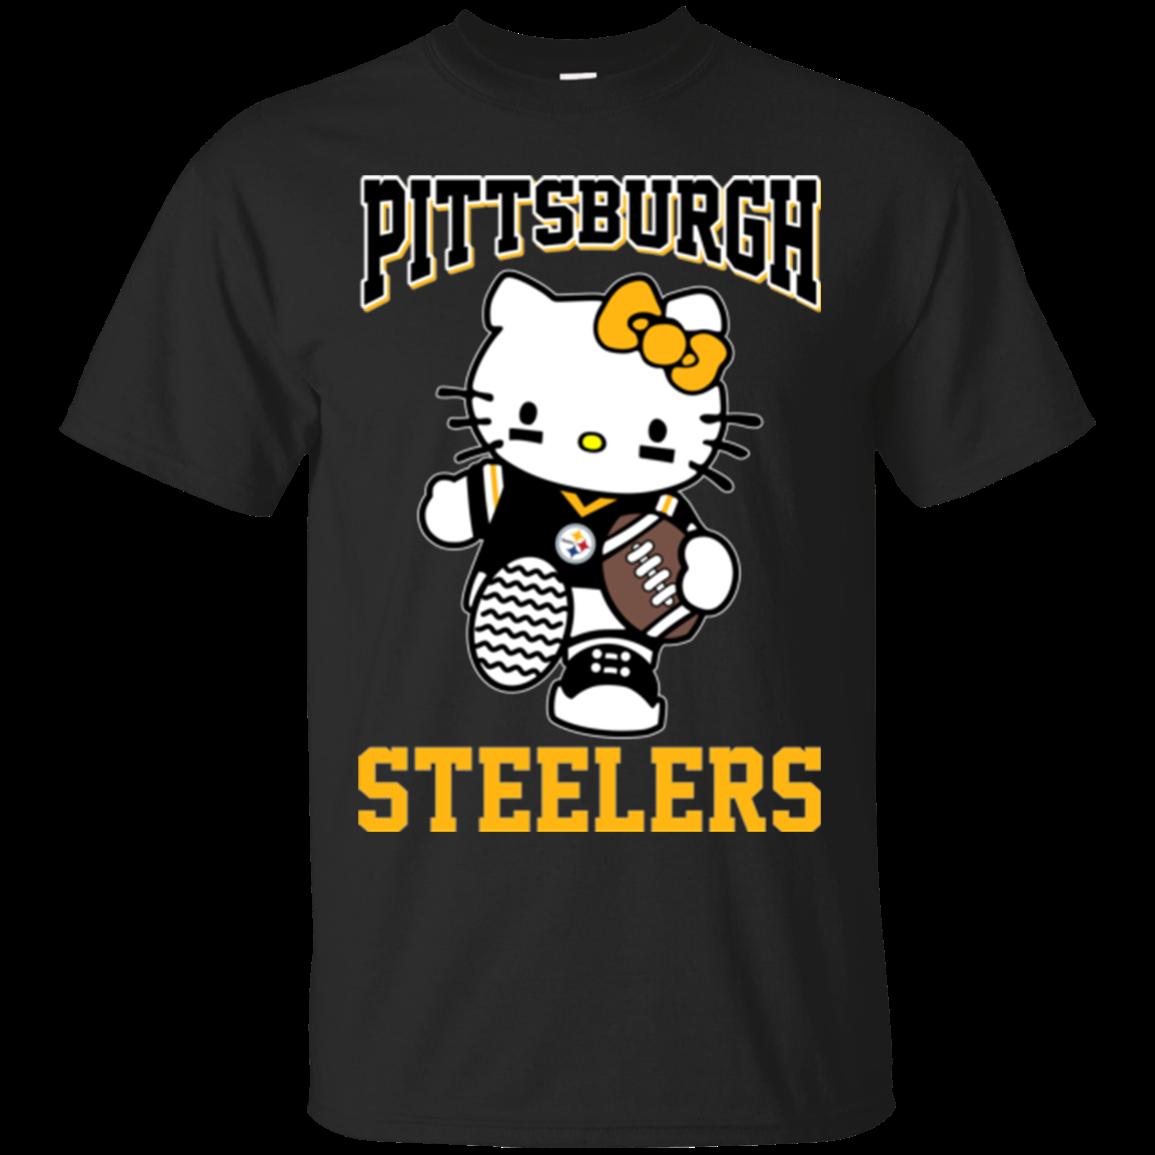 Pittsburgh Steelers Hello Kitty T shirts – Teesmiley - Hello Kitty Merchandise